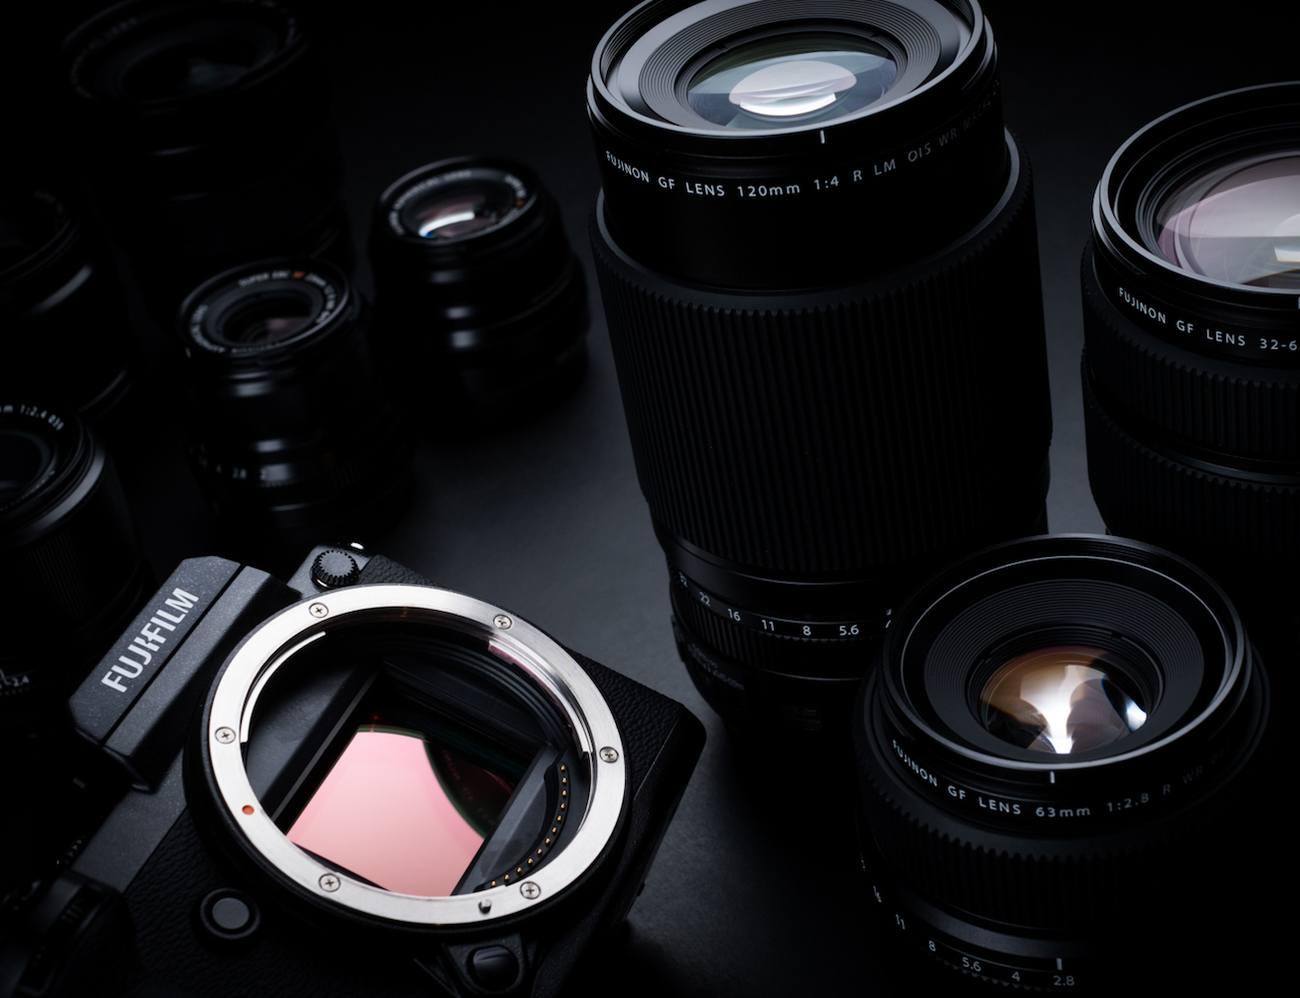 Fujifilm GFX 50S Mirrorless Camera